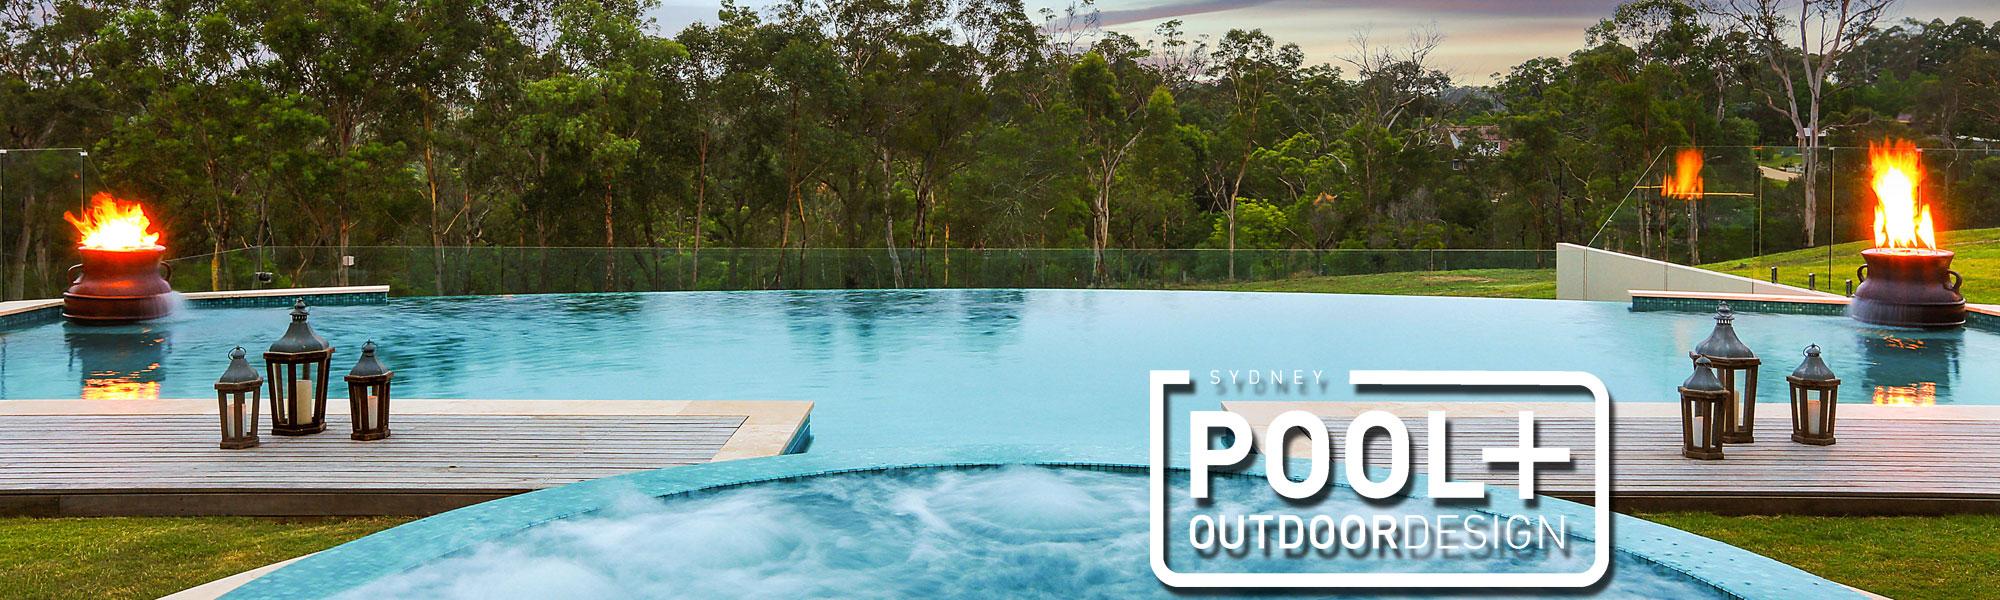 Pool and outdoor design magazine umg for Pool design magazine